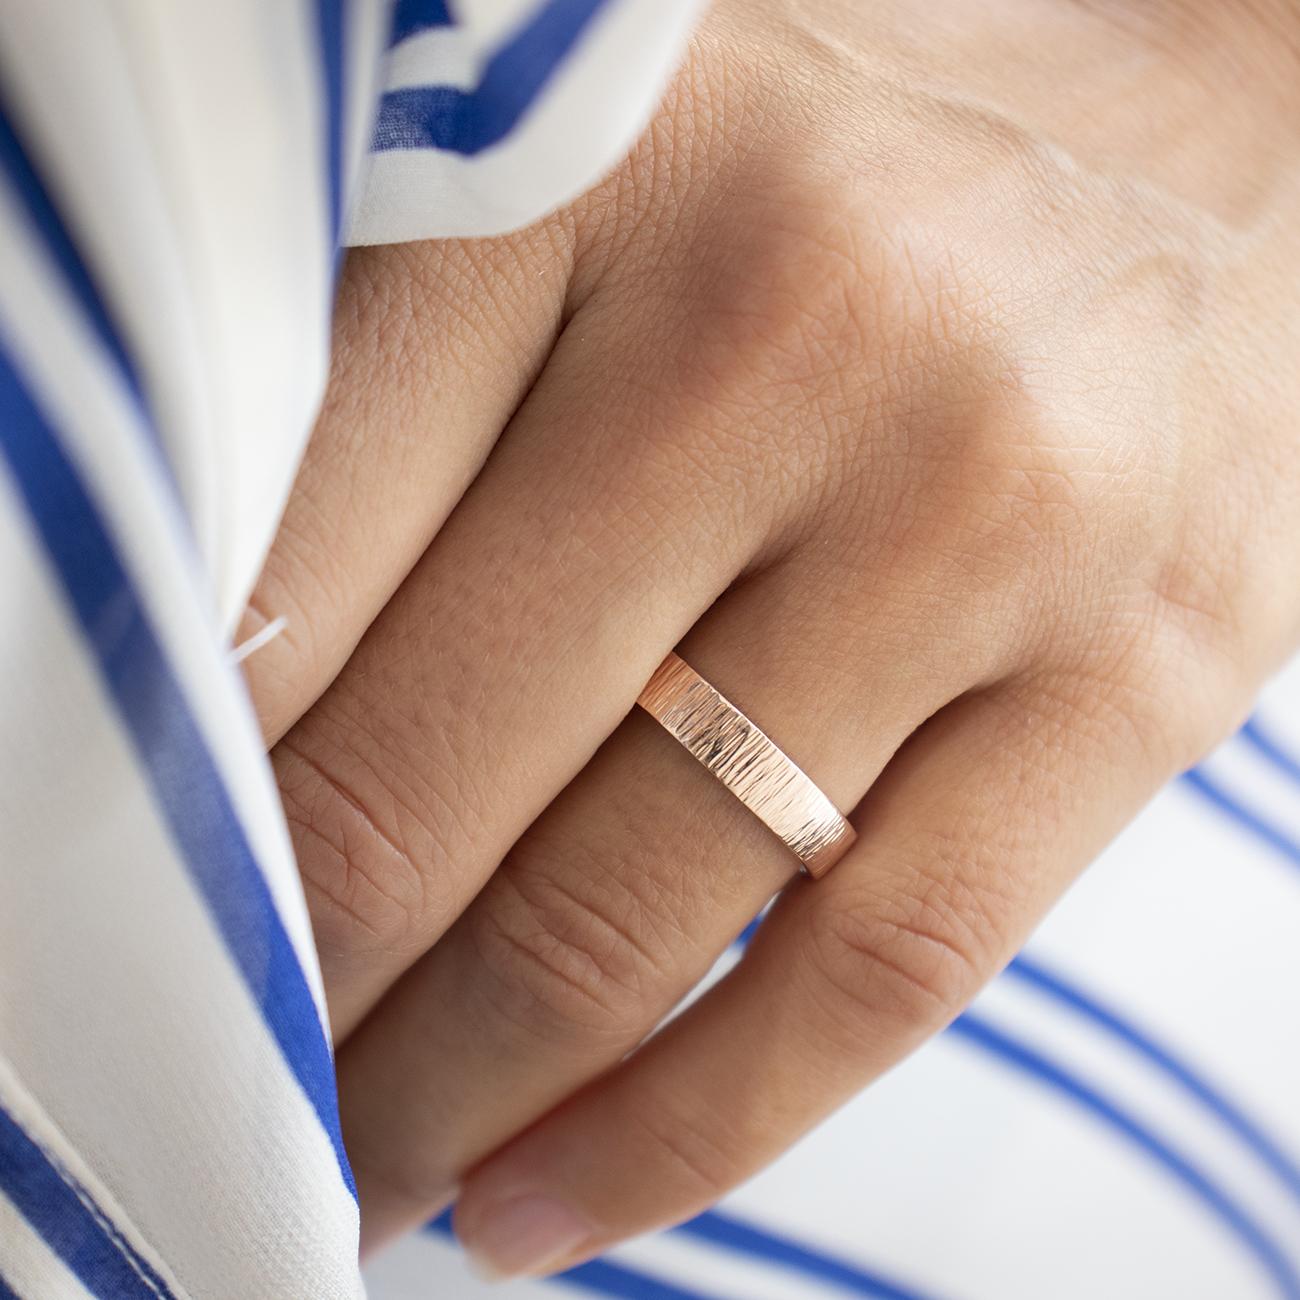 Etienne 4mm Wedding Band Hammered Wedding Bands Ethical Wedding Rings Wedding Bands